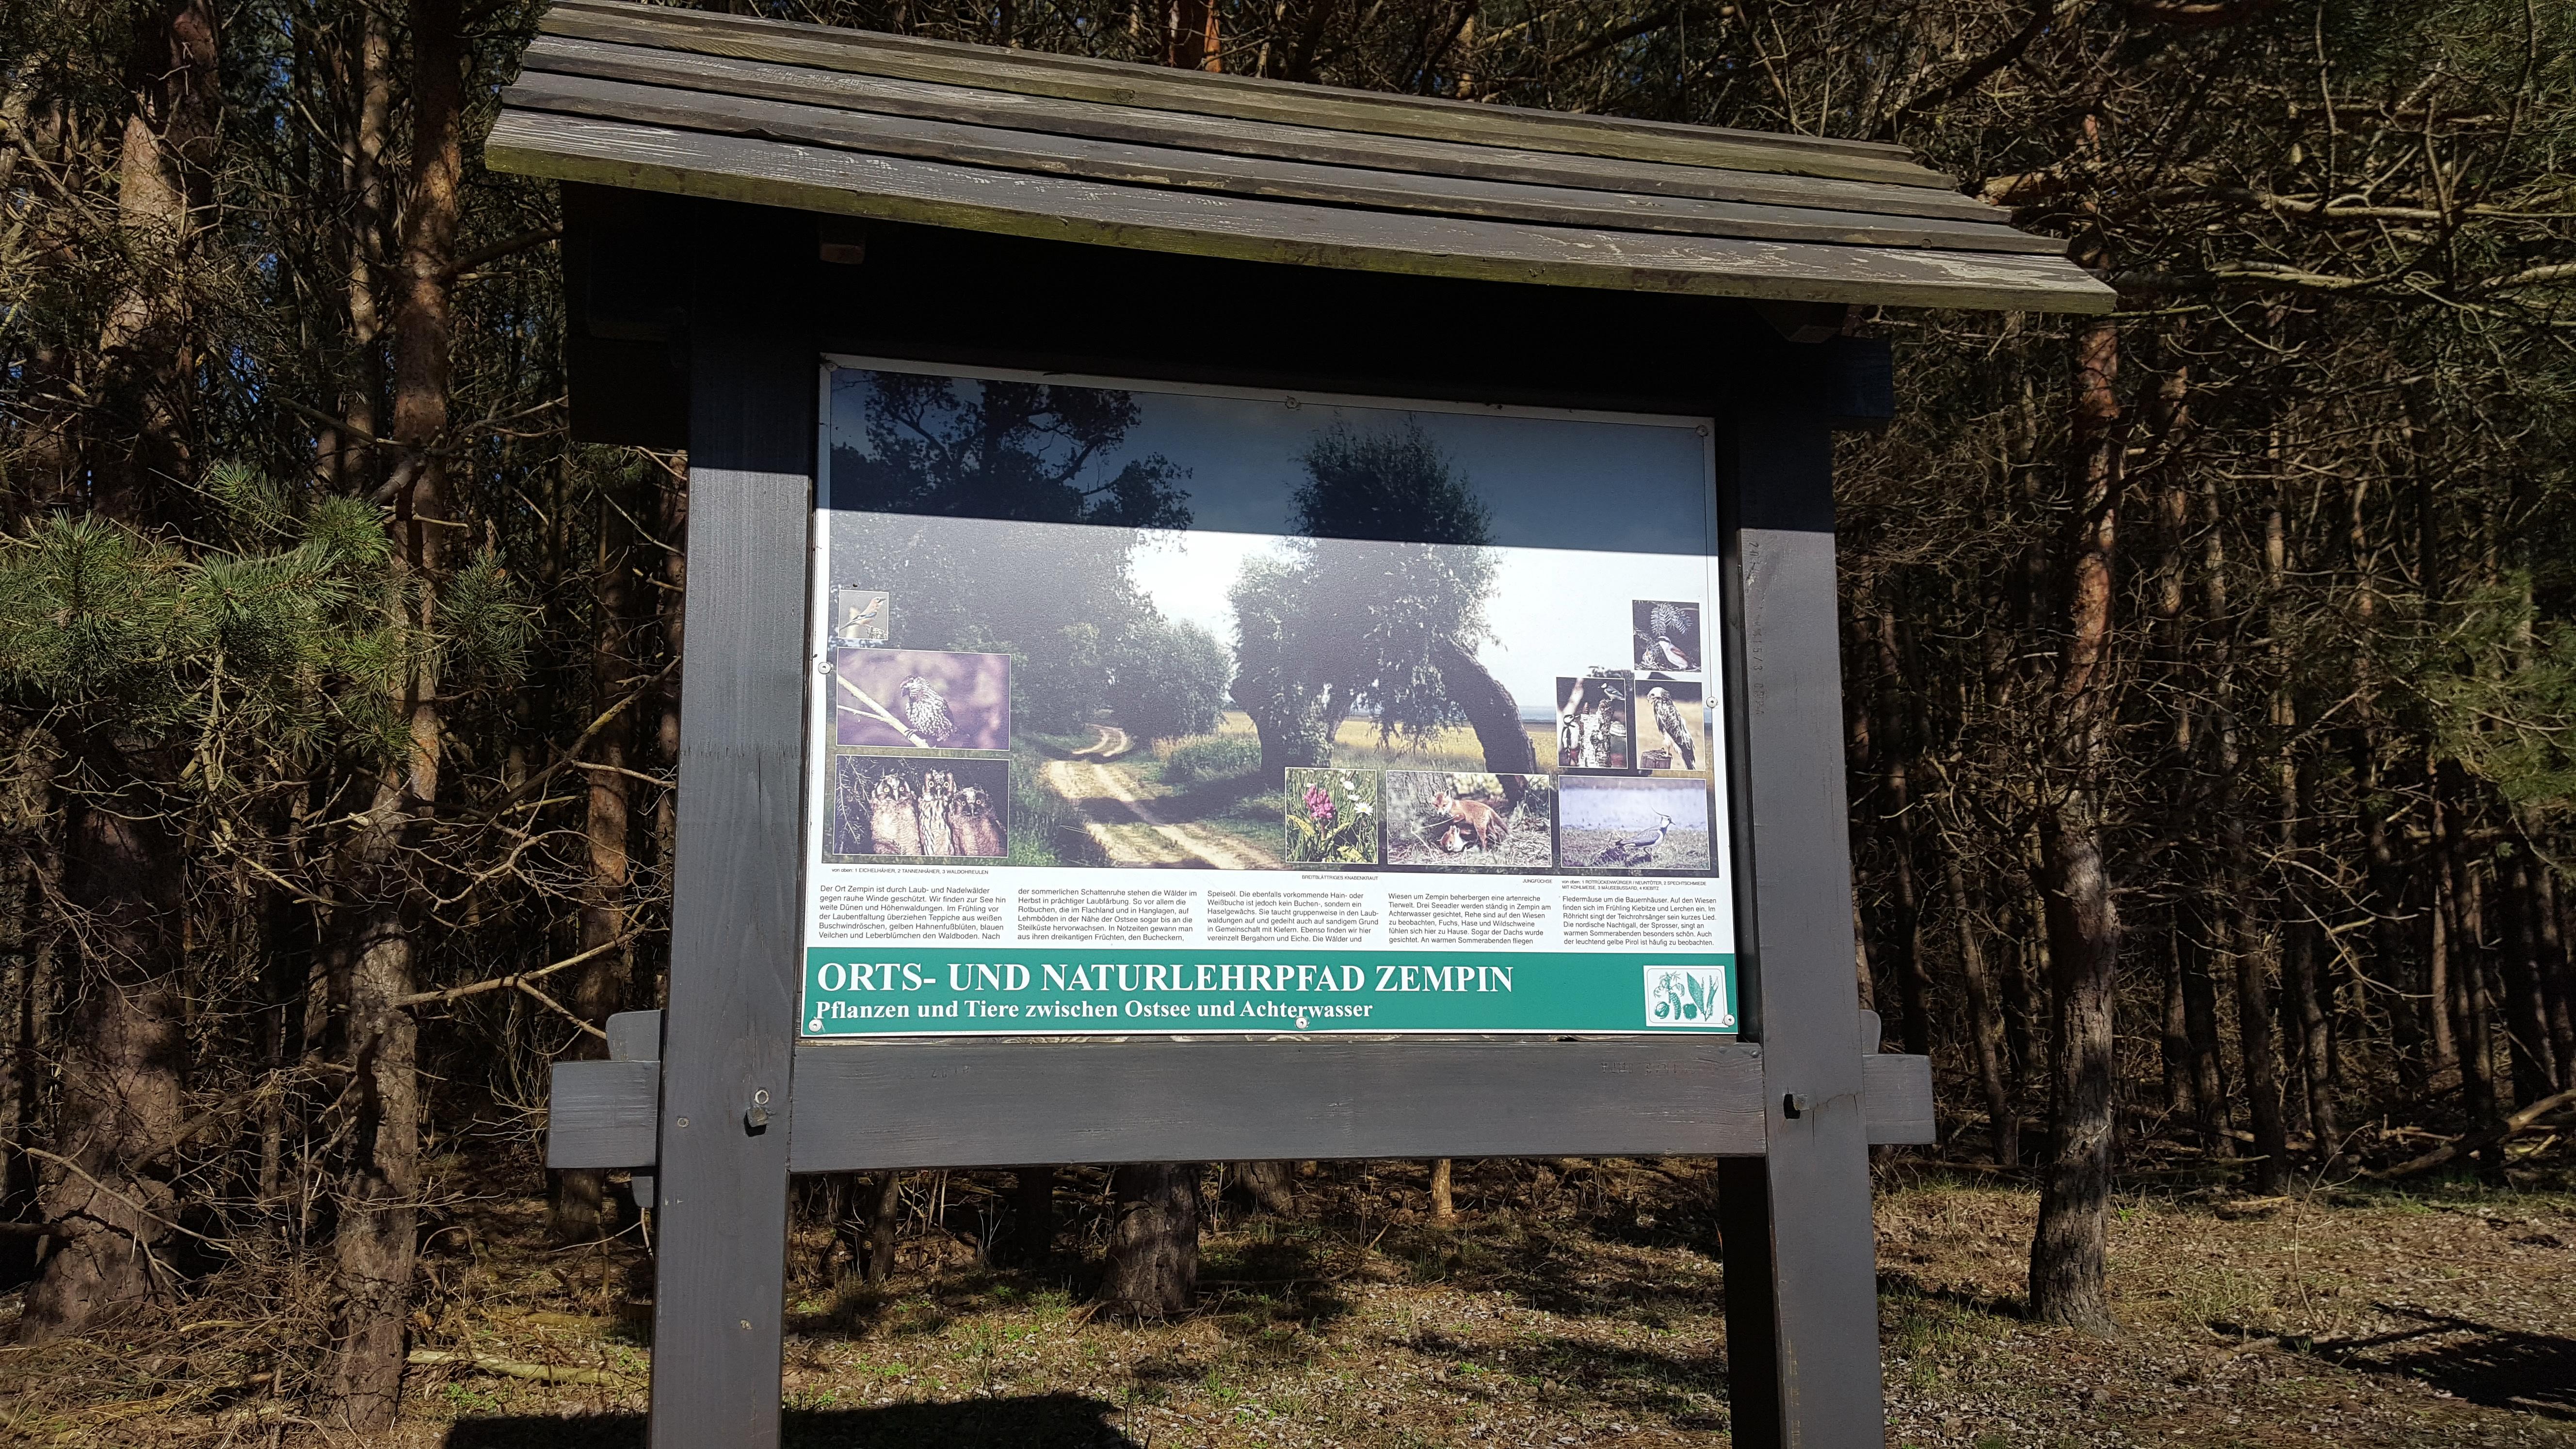 Naturlehrpfad - Markierung Wanderwege Zempin Insel Usdeom Ausflusgziel